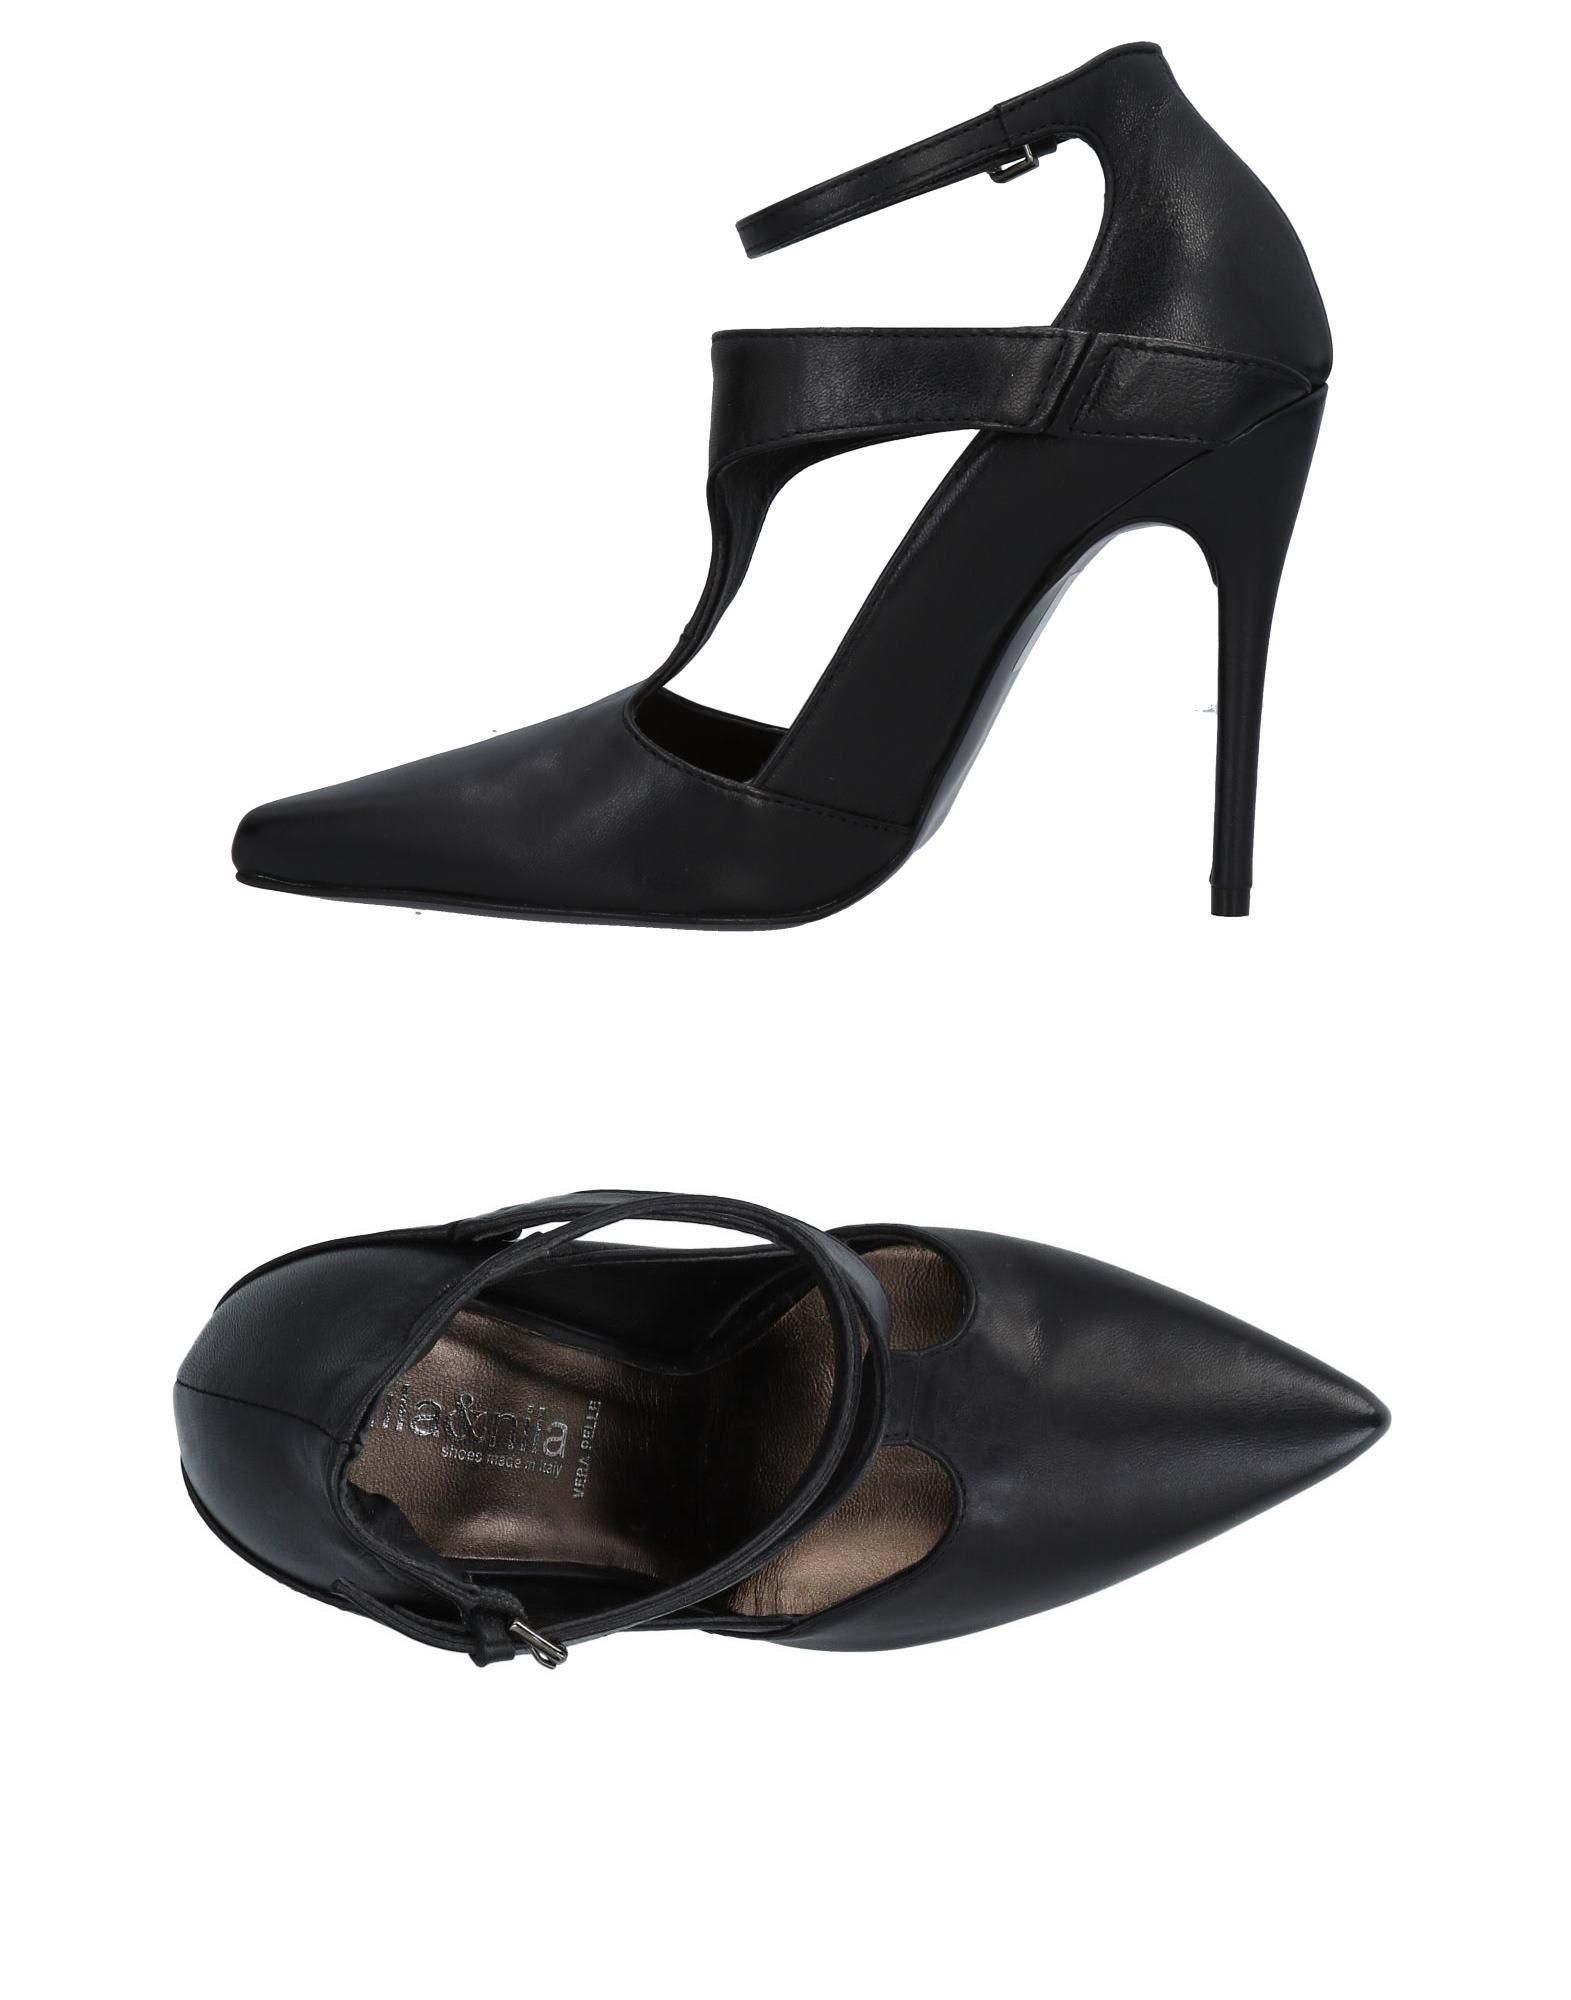 Nila & Nila Pumps Damen   Damen 11473344BQ Gute Qualität beliebte Schuhe 2f92c7